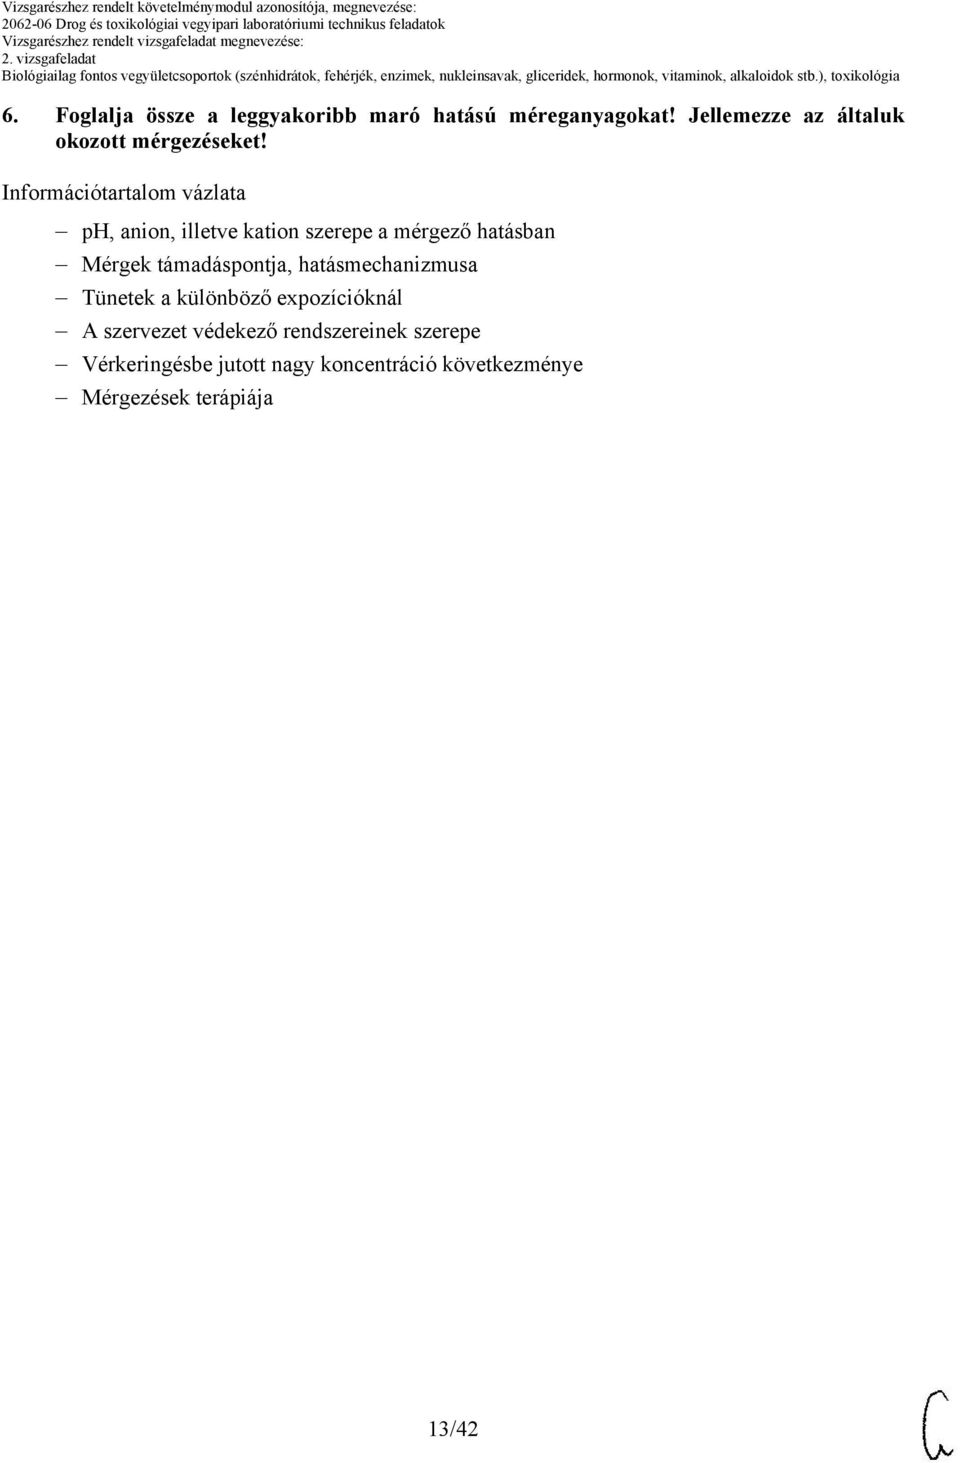 analóg a drog mérgező)